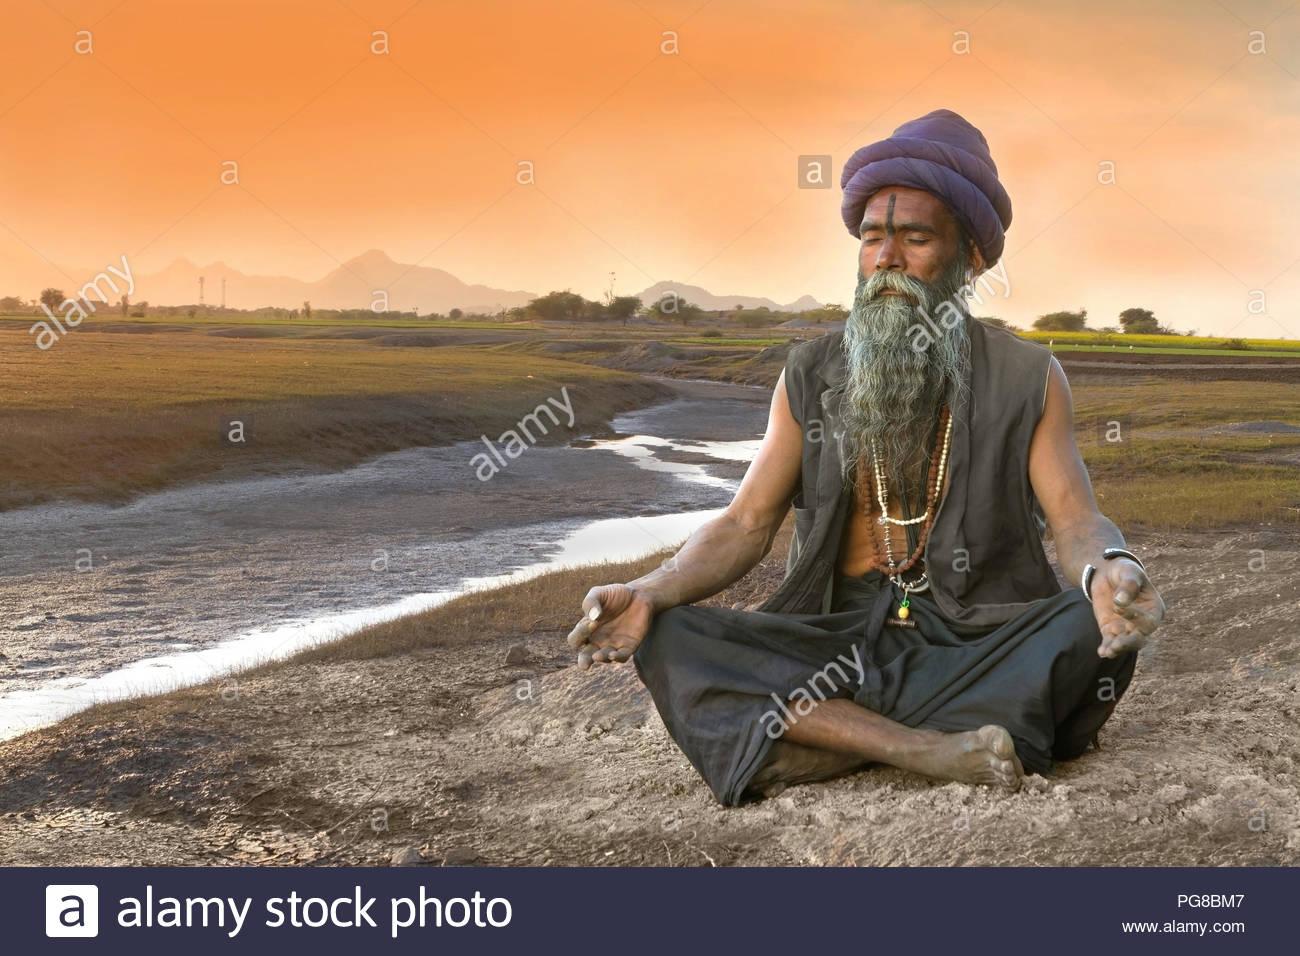 Indian Sadhu meditation at bank of river - Stock Image